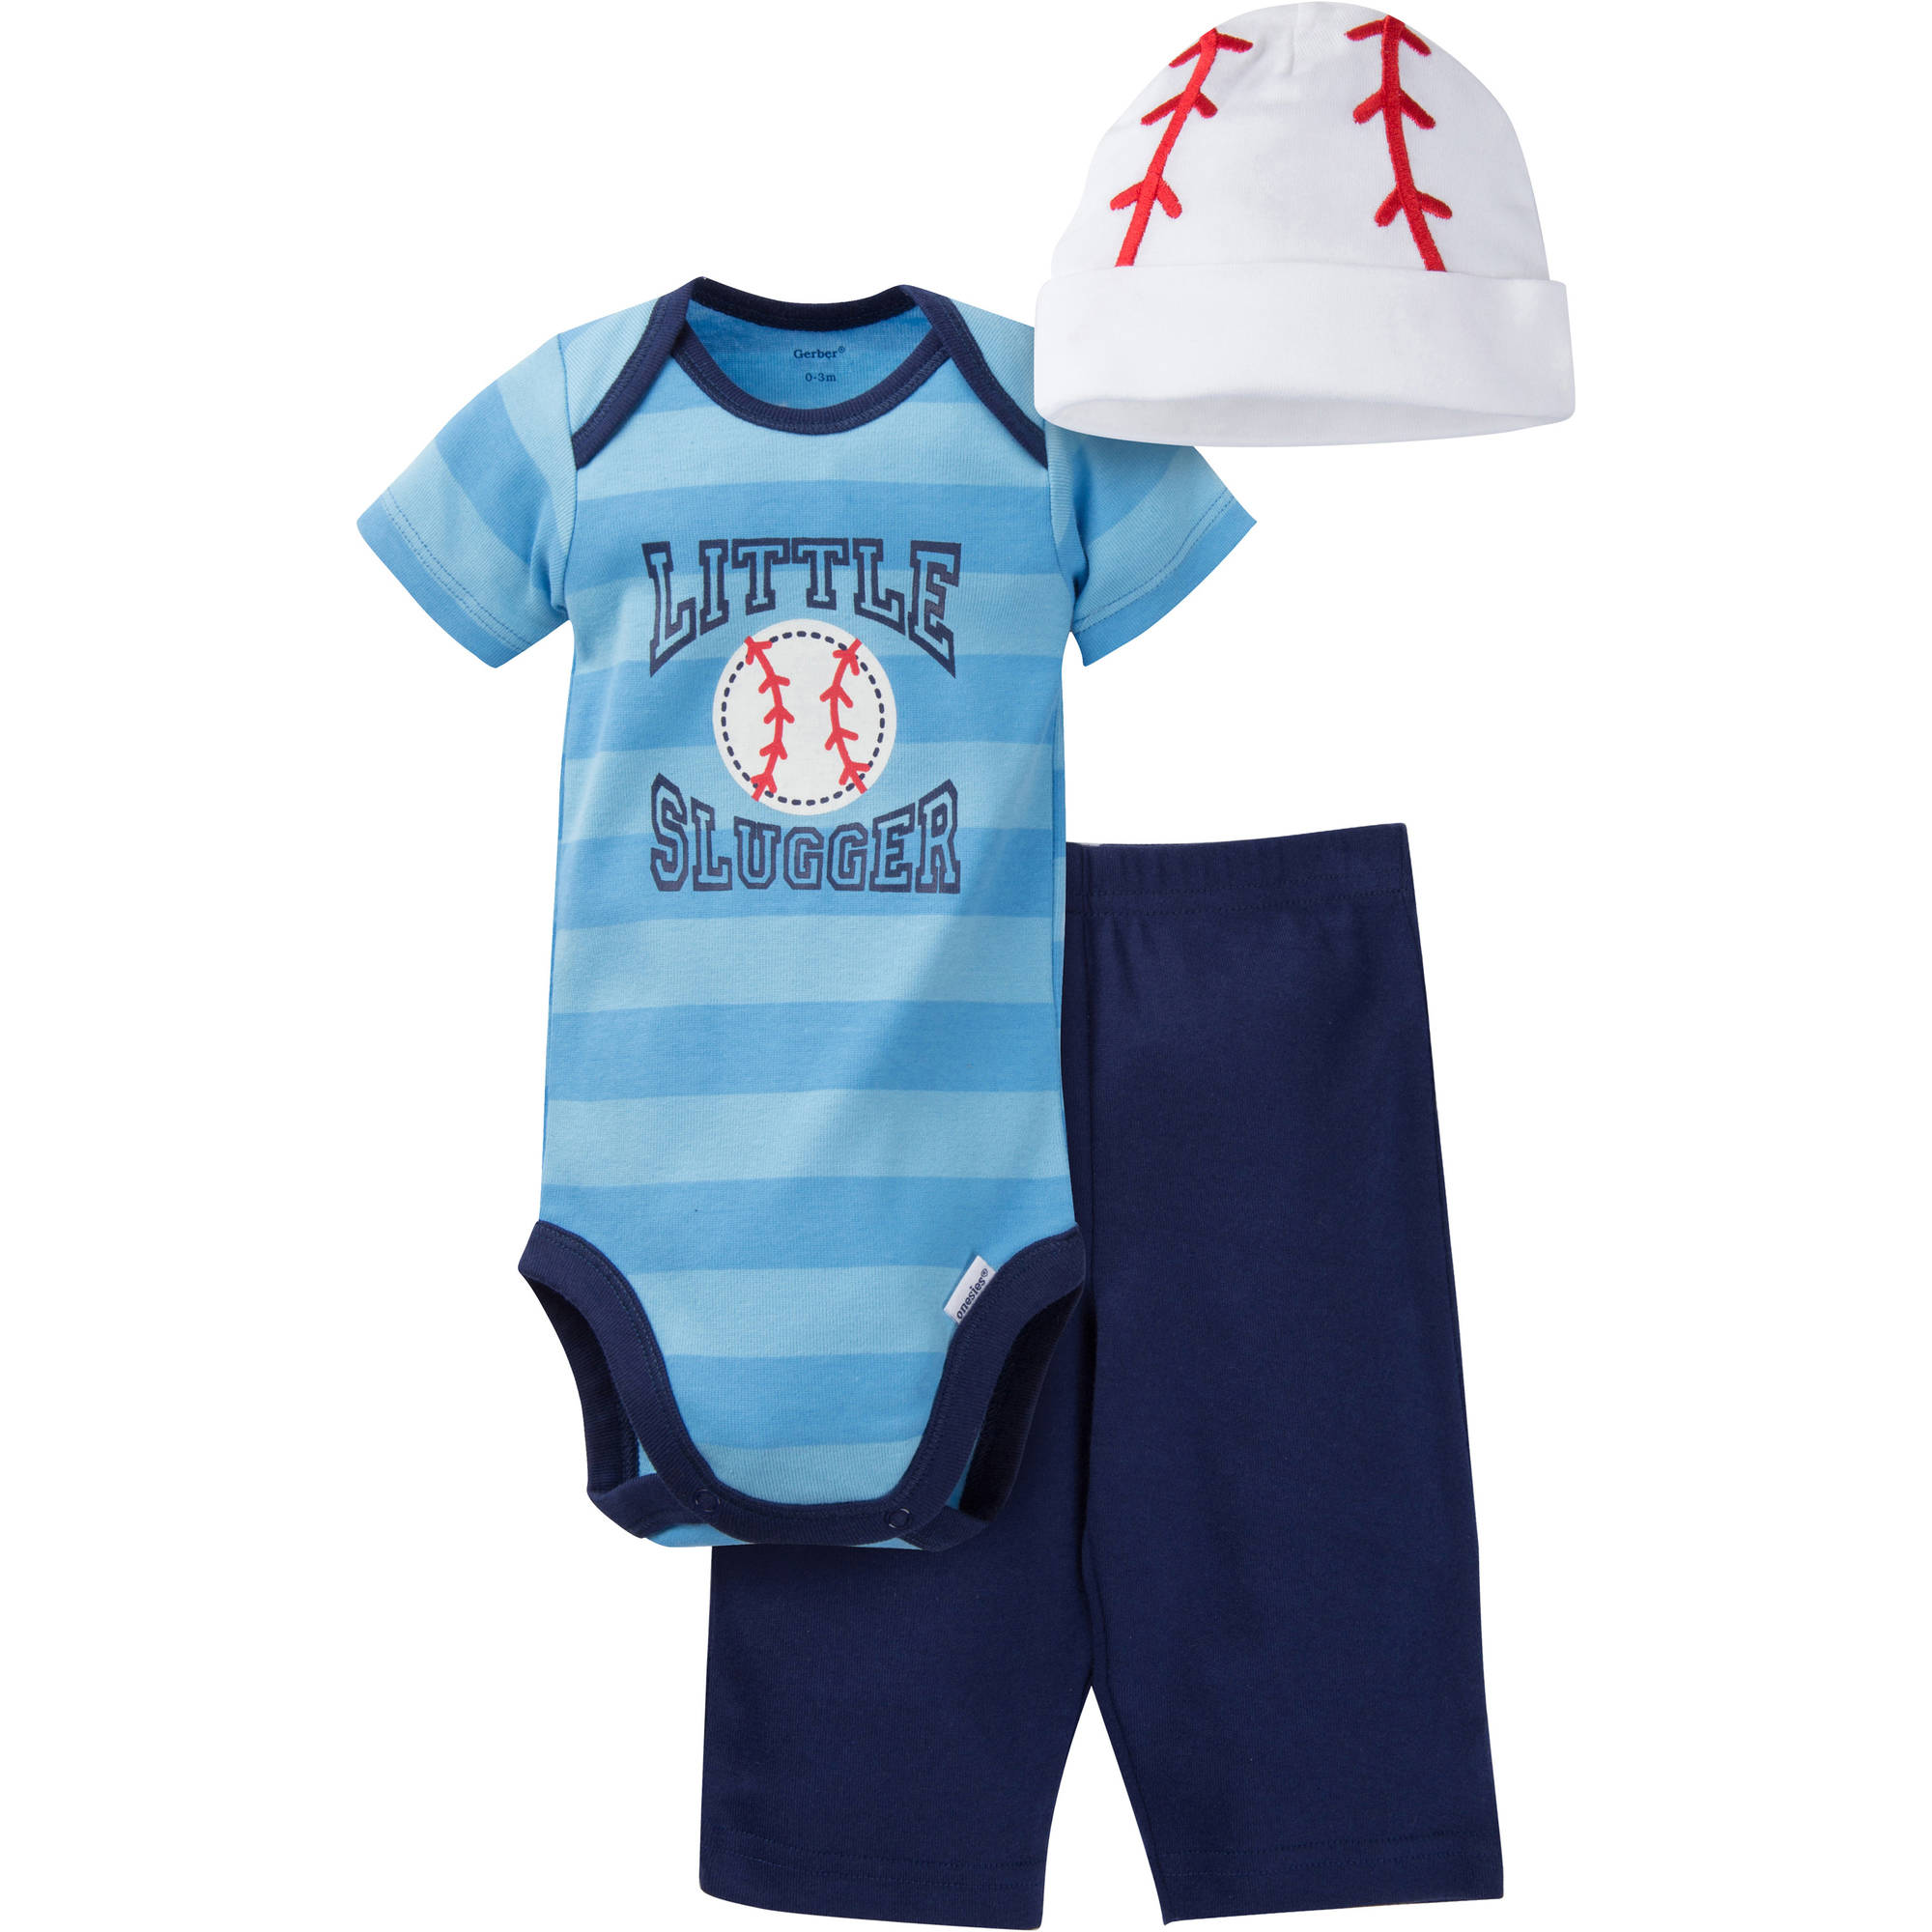 Gerber Newborn Baby Boy Bodysuit, Pant and Cap Outfit Set,  3-Piece